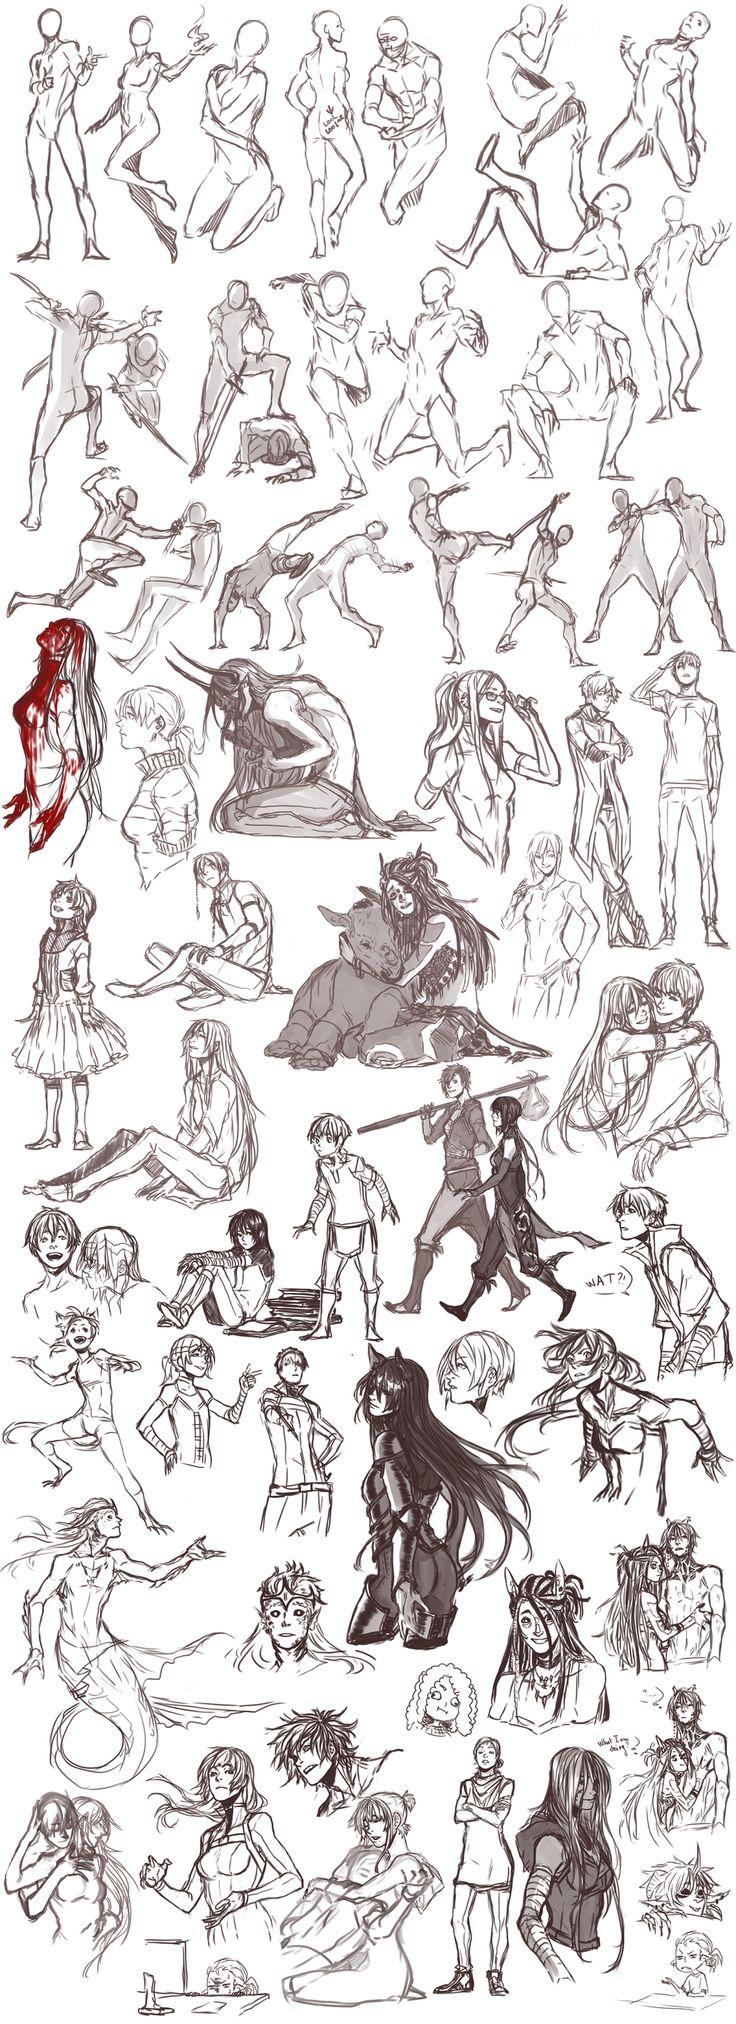 Sketch dump 26 by Namonn on DeviantArt